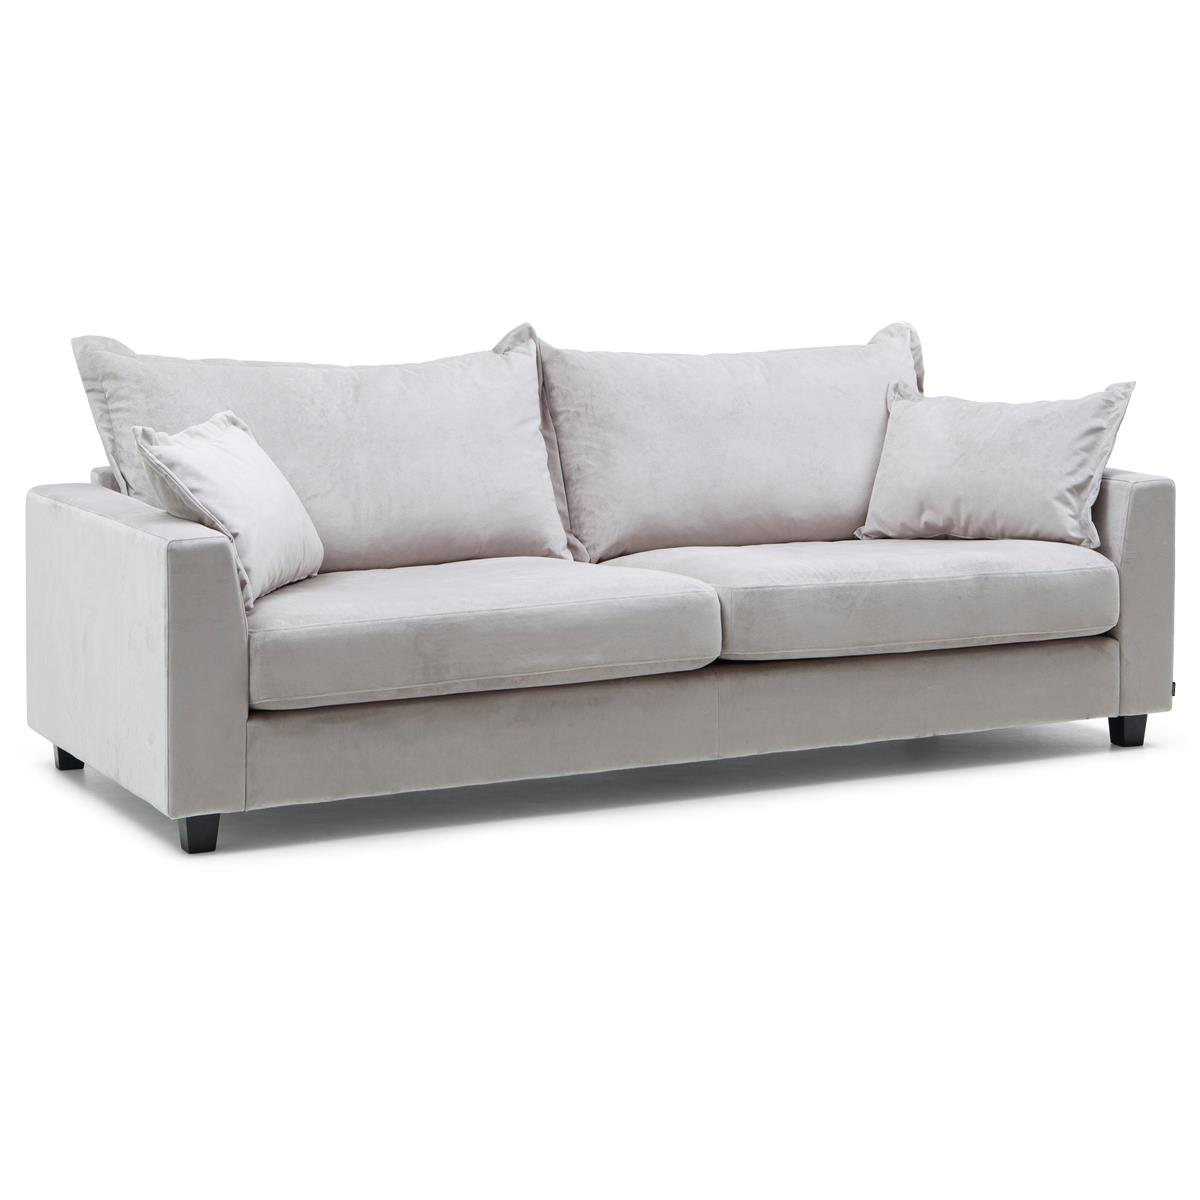 Louise soffa 3-sits meda silver vinkel